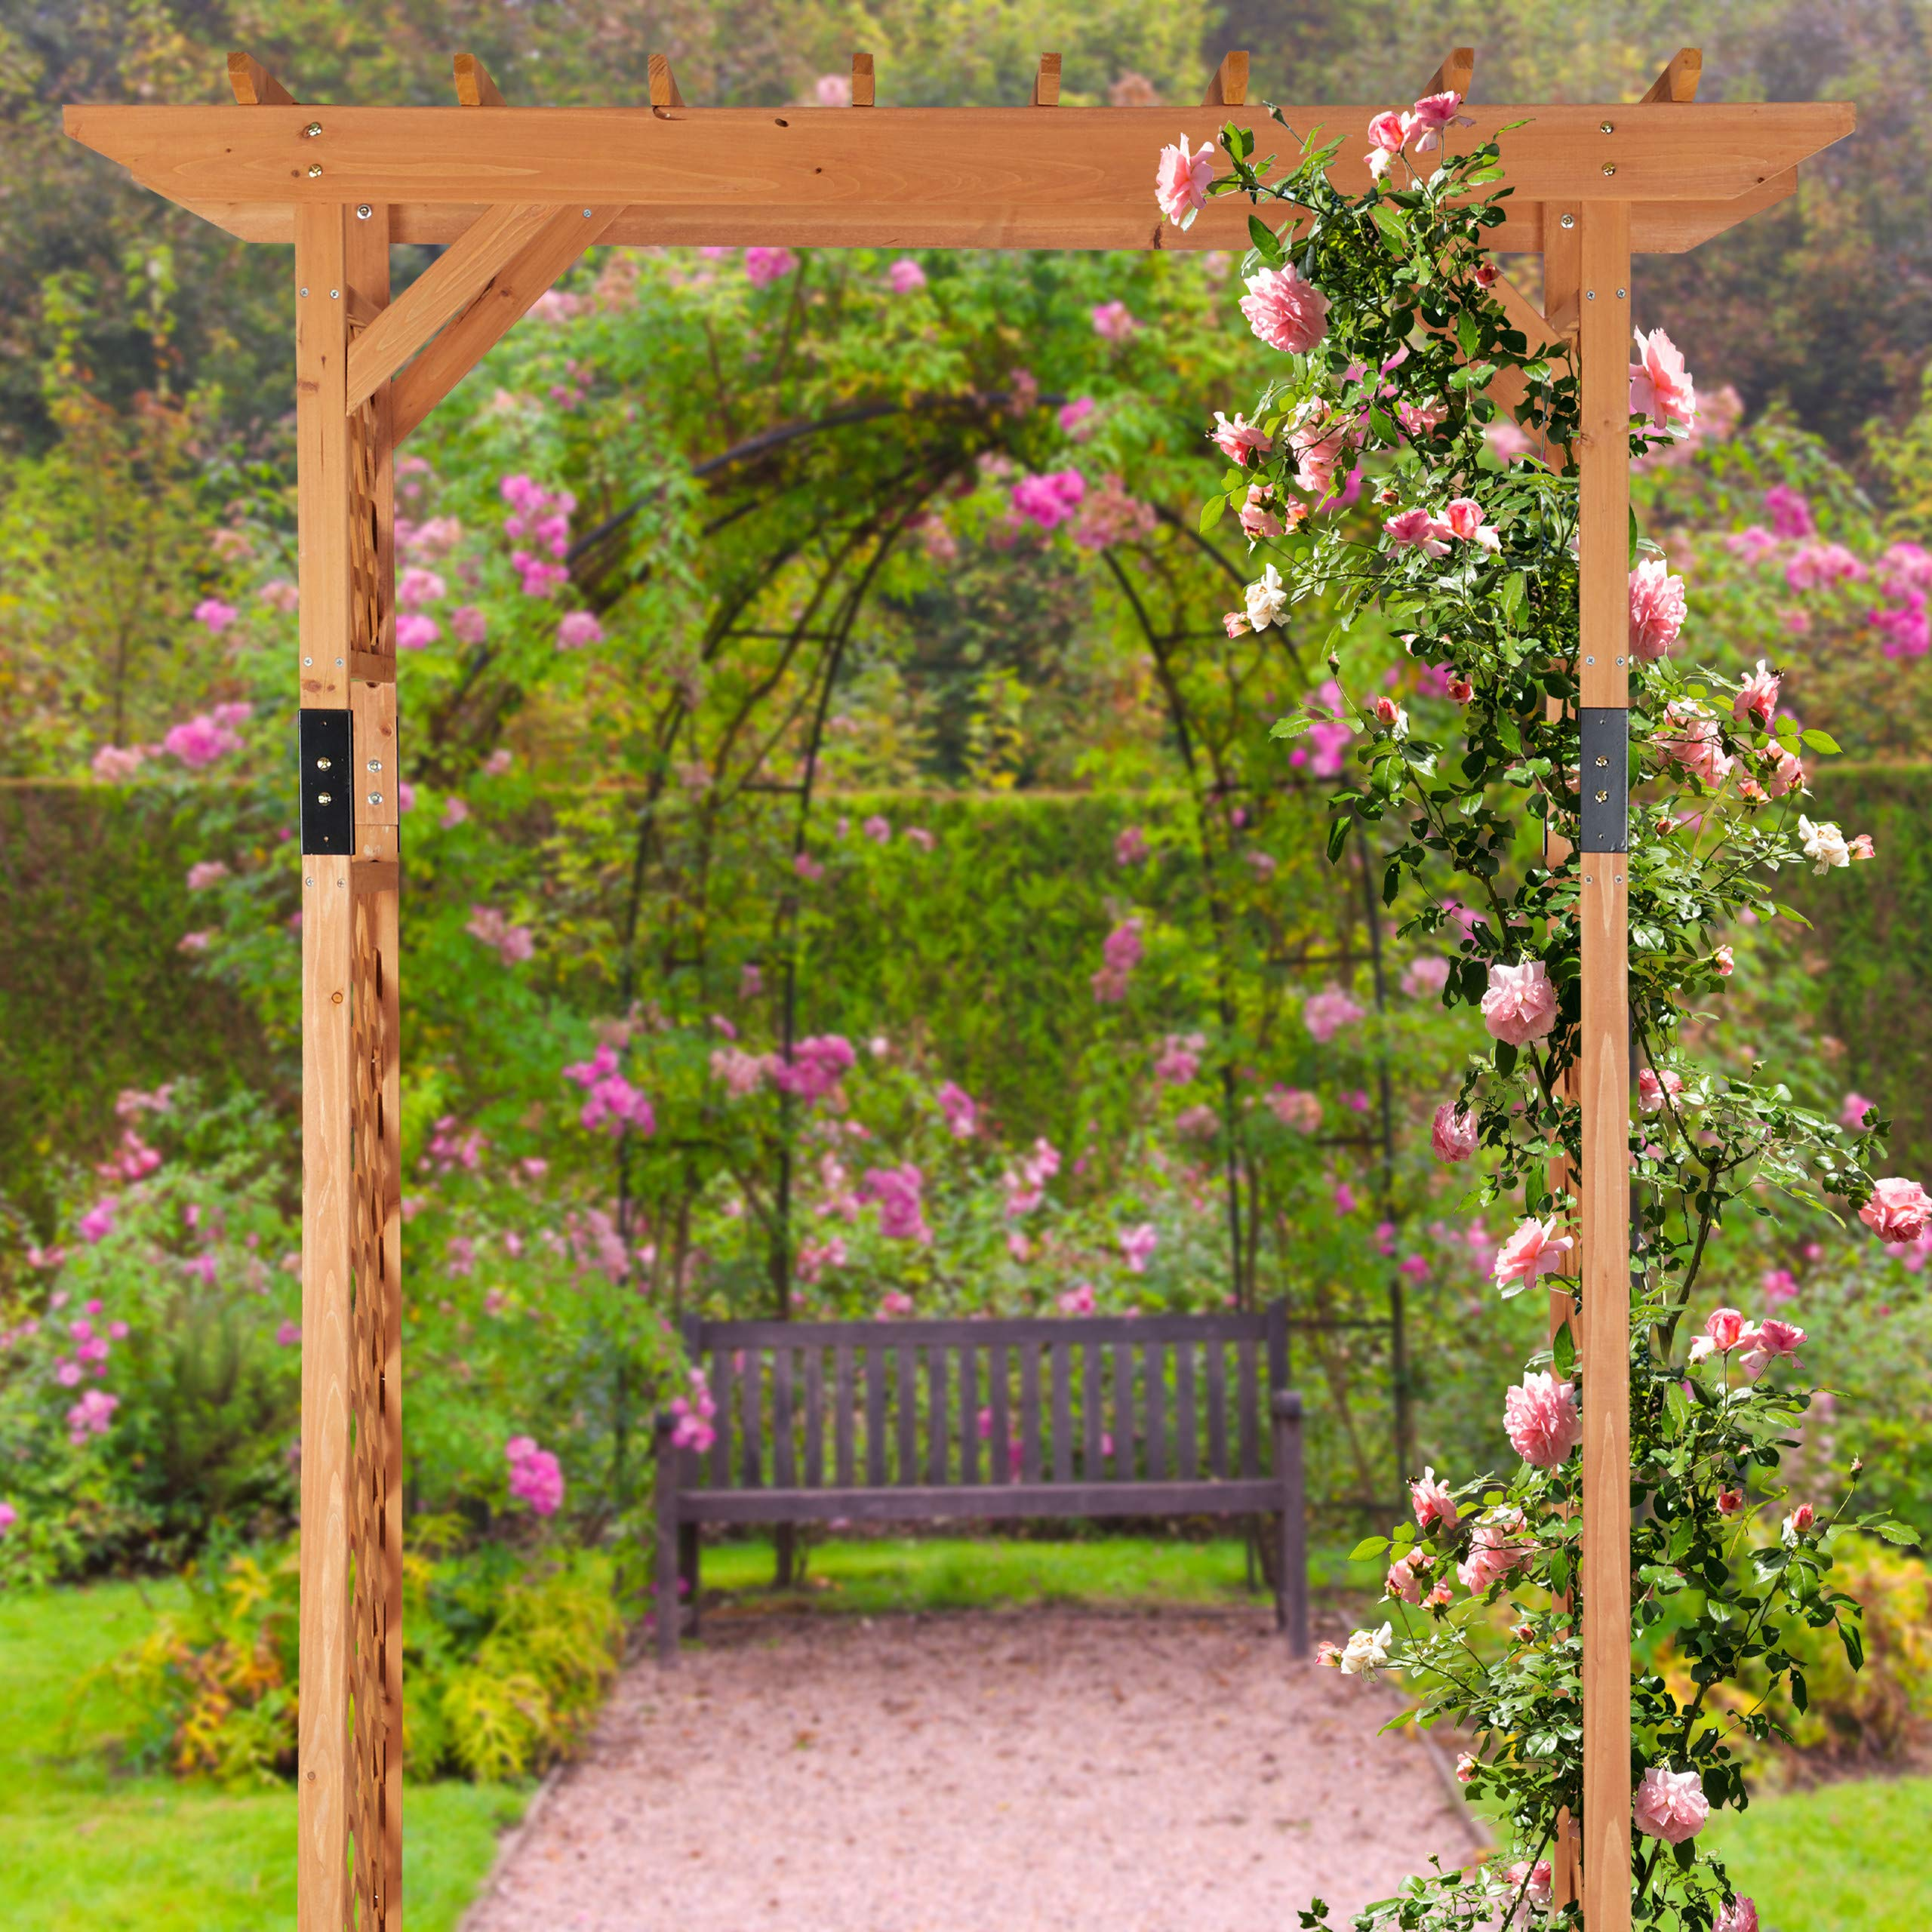 Relaxdays Pérgola de jardín, Arco para Rosas, Soporte para Plantas, Madera, 230x162x79 cm, Naranja: Amazon.es: Jardín